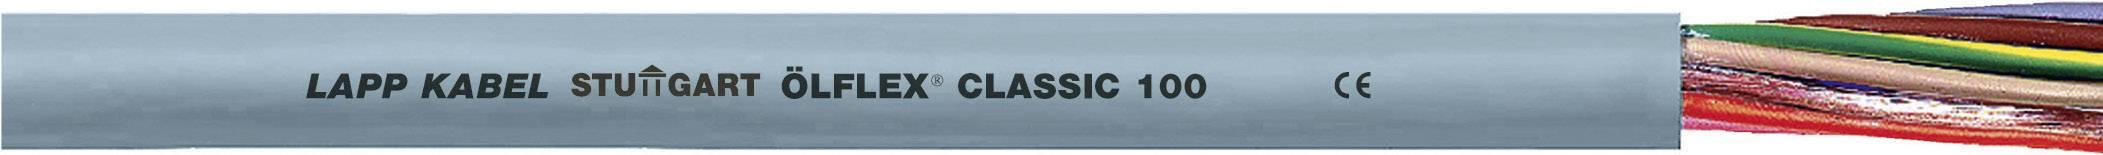 Kabel LappKabel Ölflex CLASSIC 100 21G0,5 (0010011), PVC, 11,7 mm, 500 V, šedá, 50 m